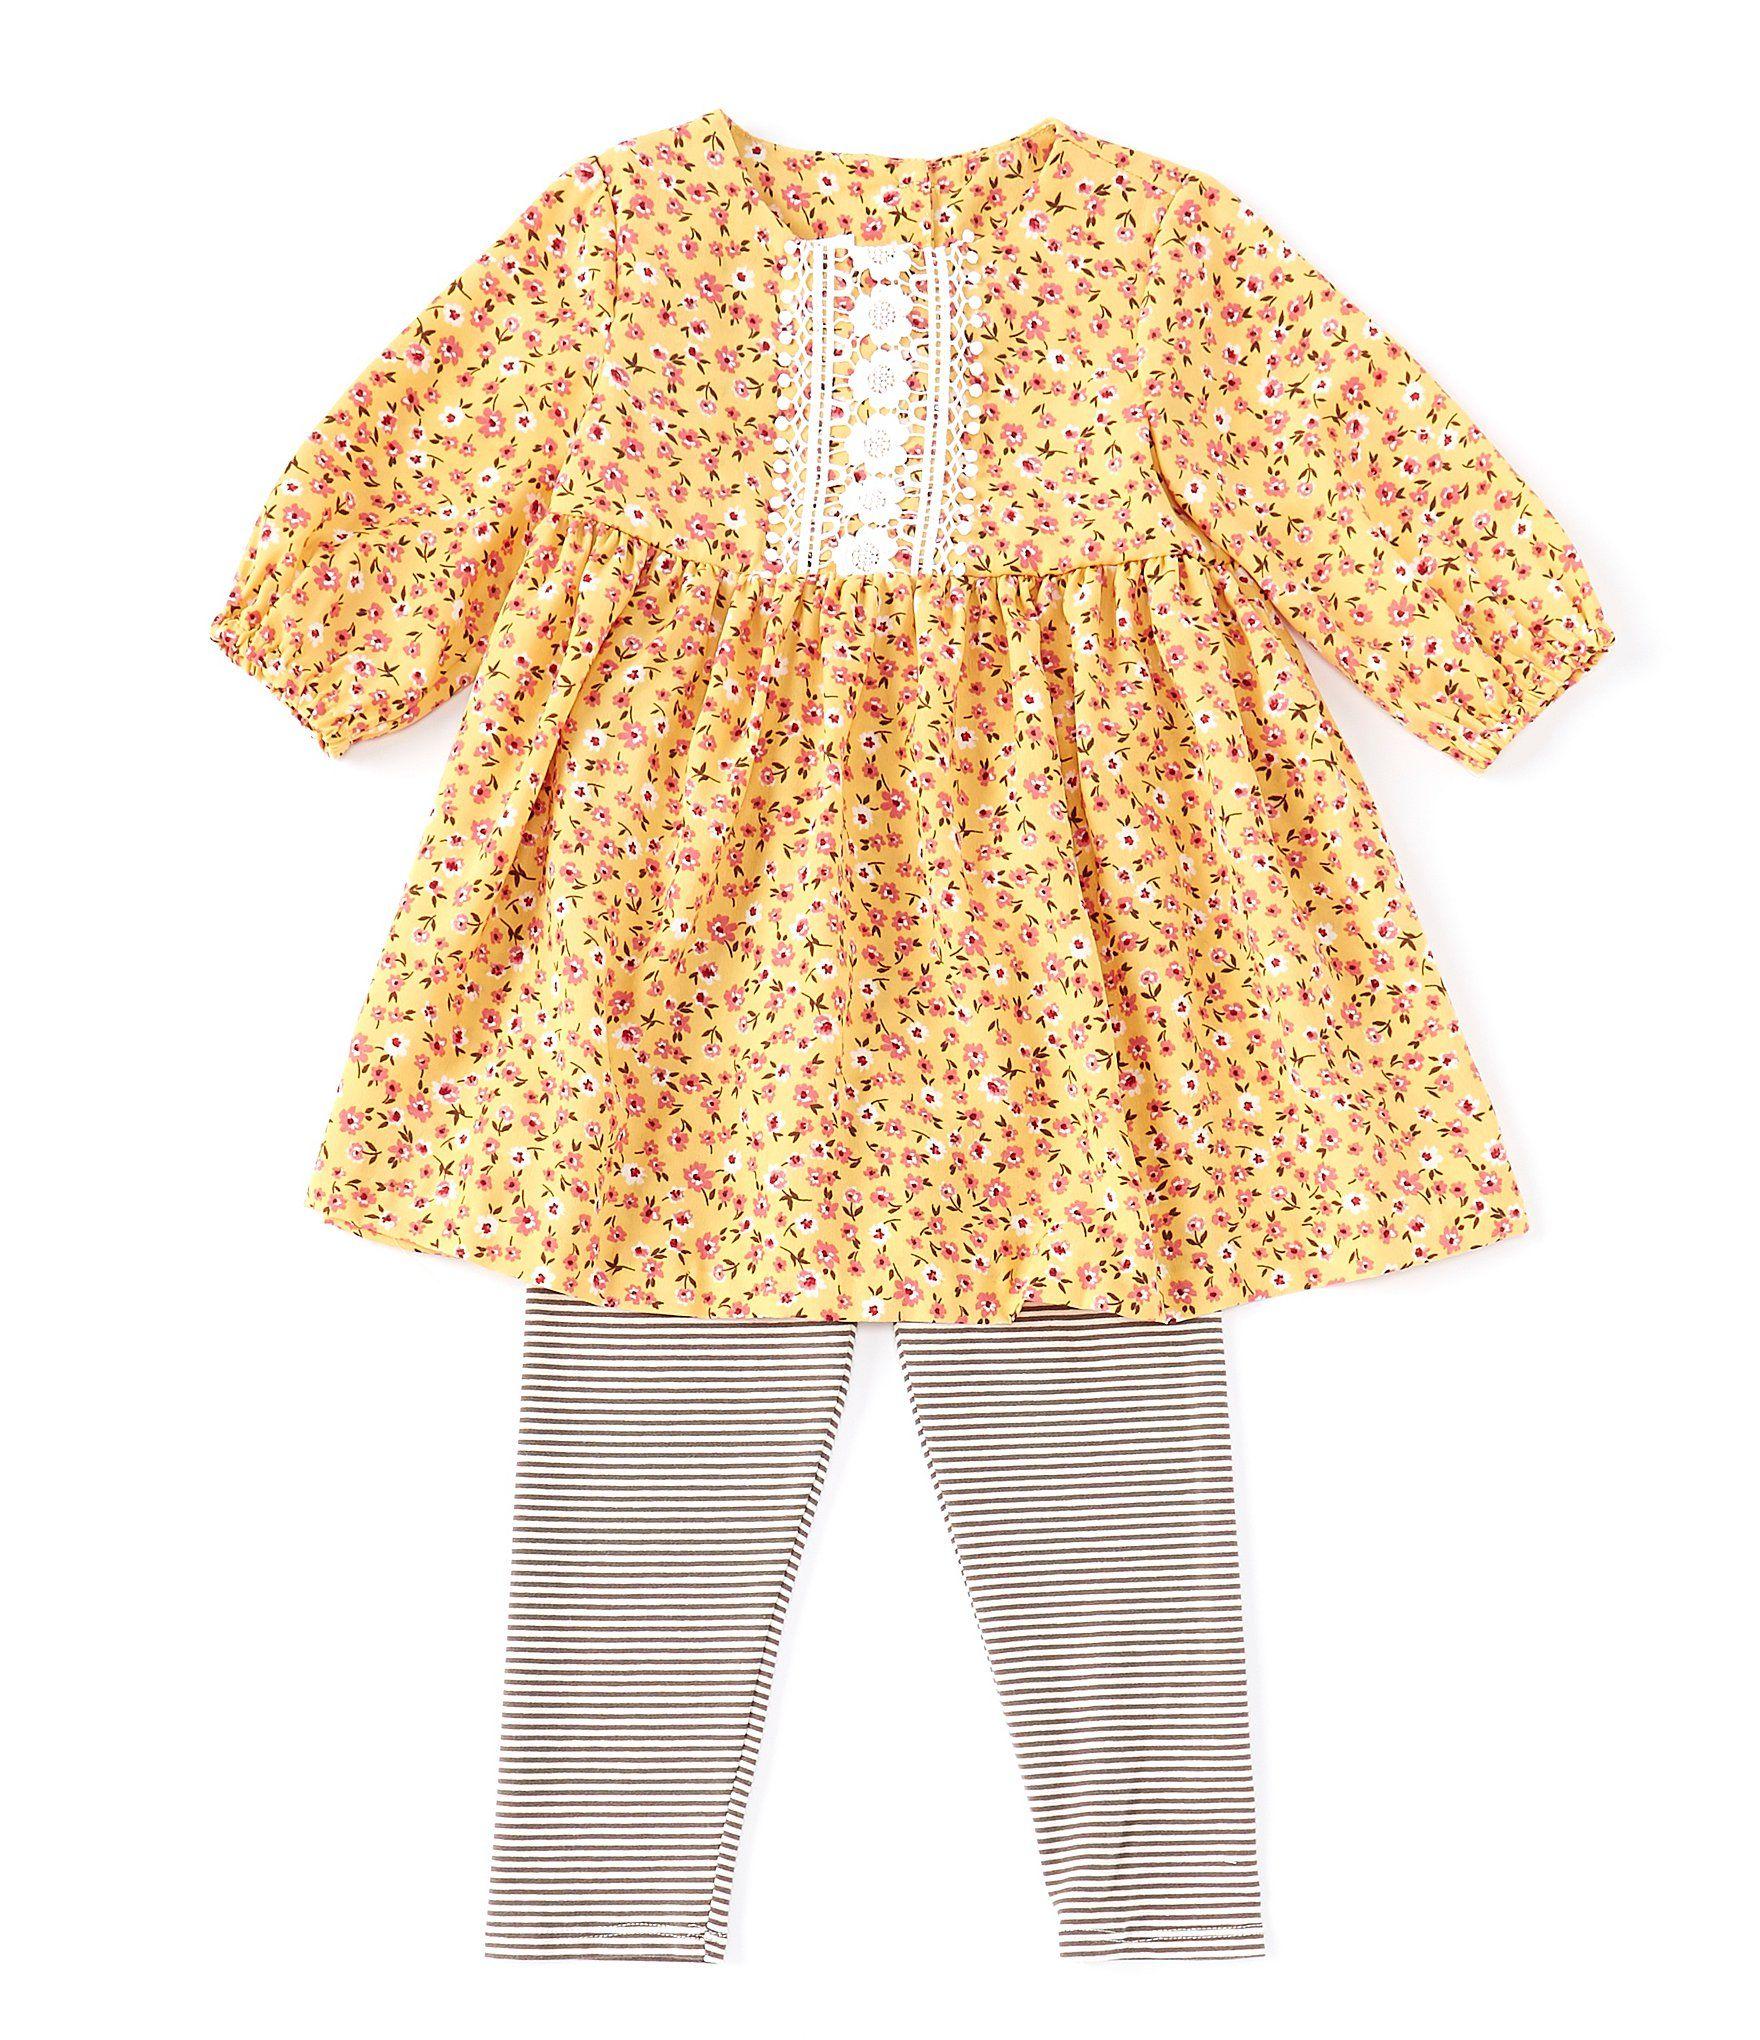 Bonnie Jean Little Girls 2T-6X Ditsy-Floral Tunic  Striped Leggings Set - Yellow 6X #stripedleggings